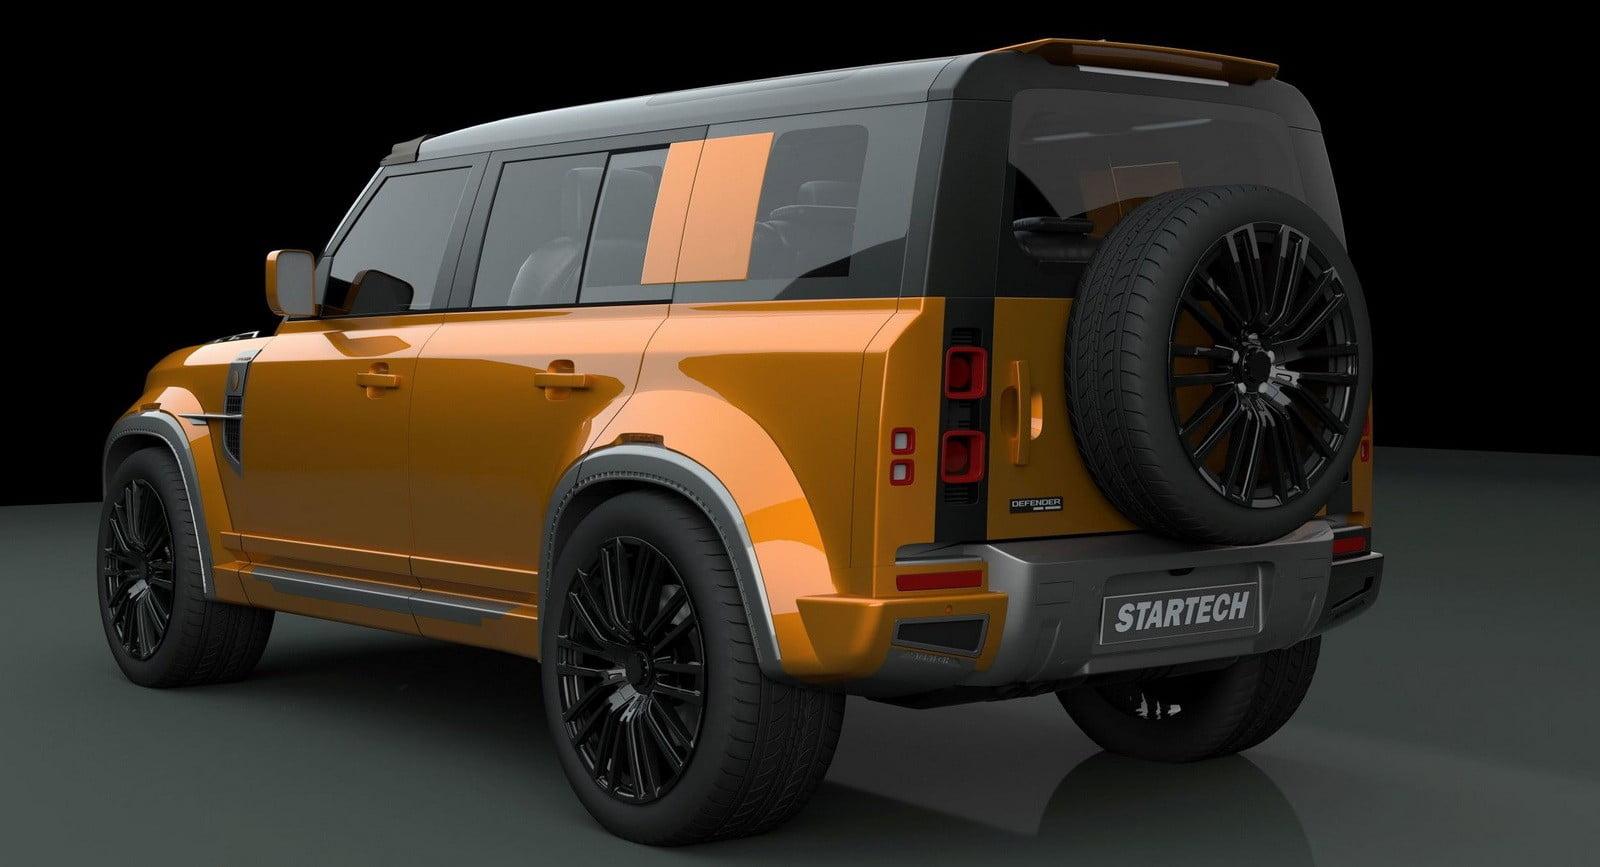 Startech Land Rover Defender 2020